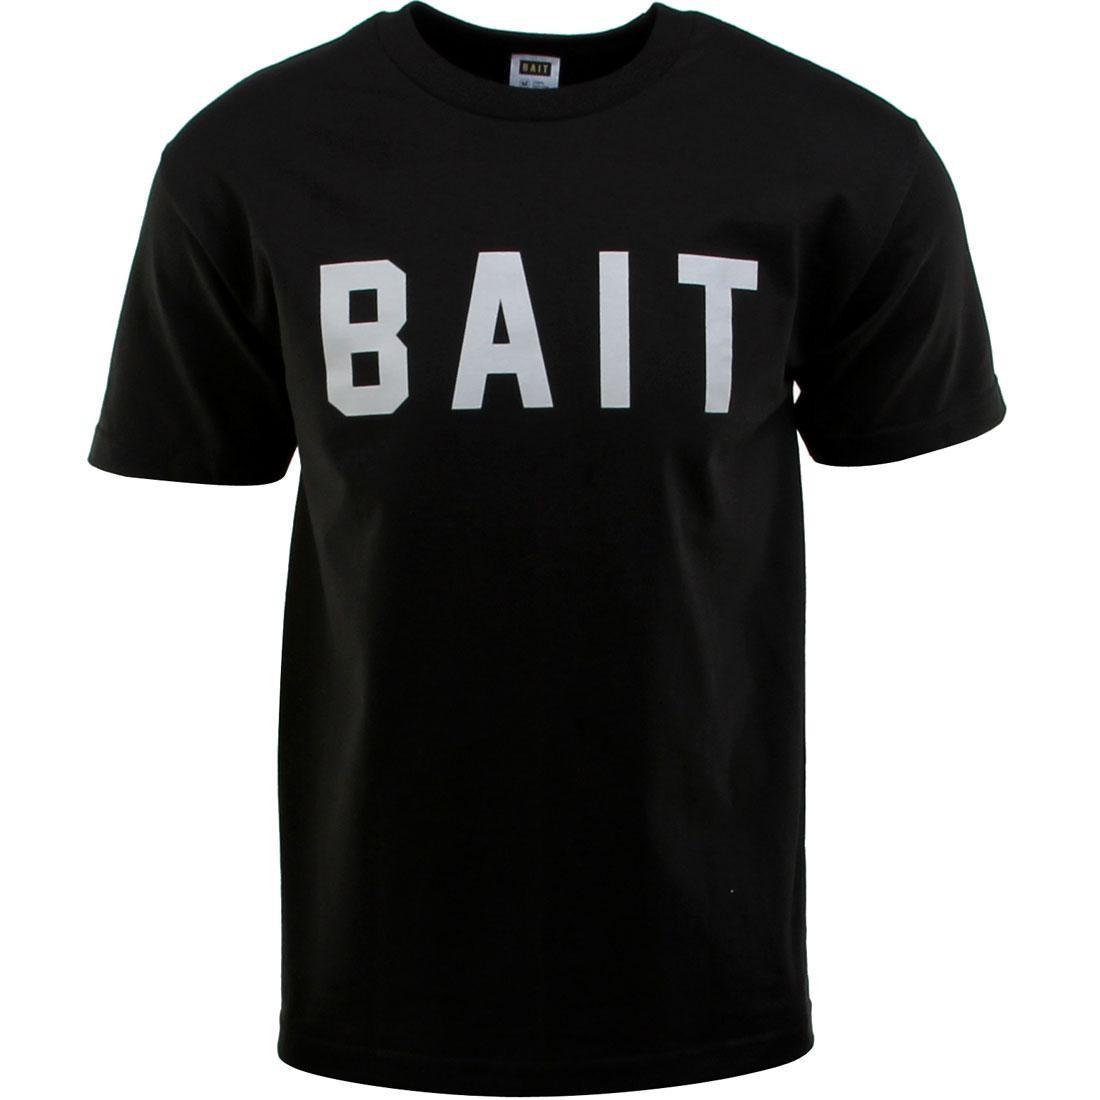 BAIT Logo Tee (black / gray)